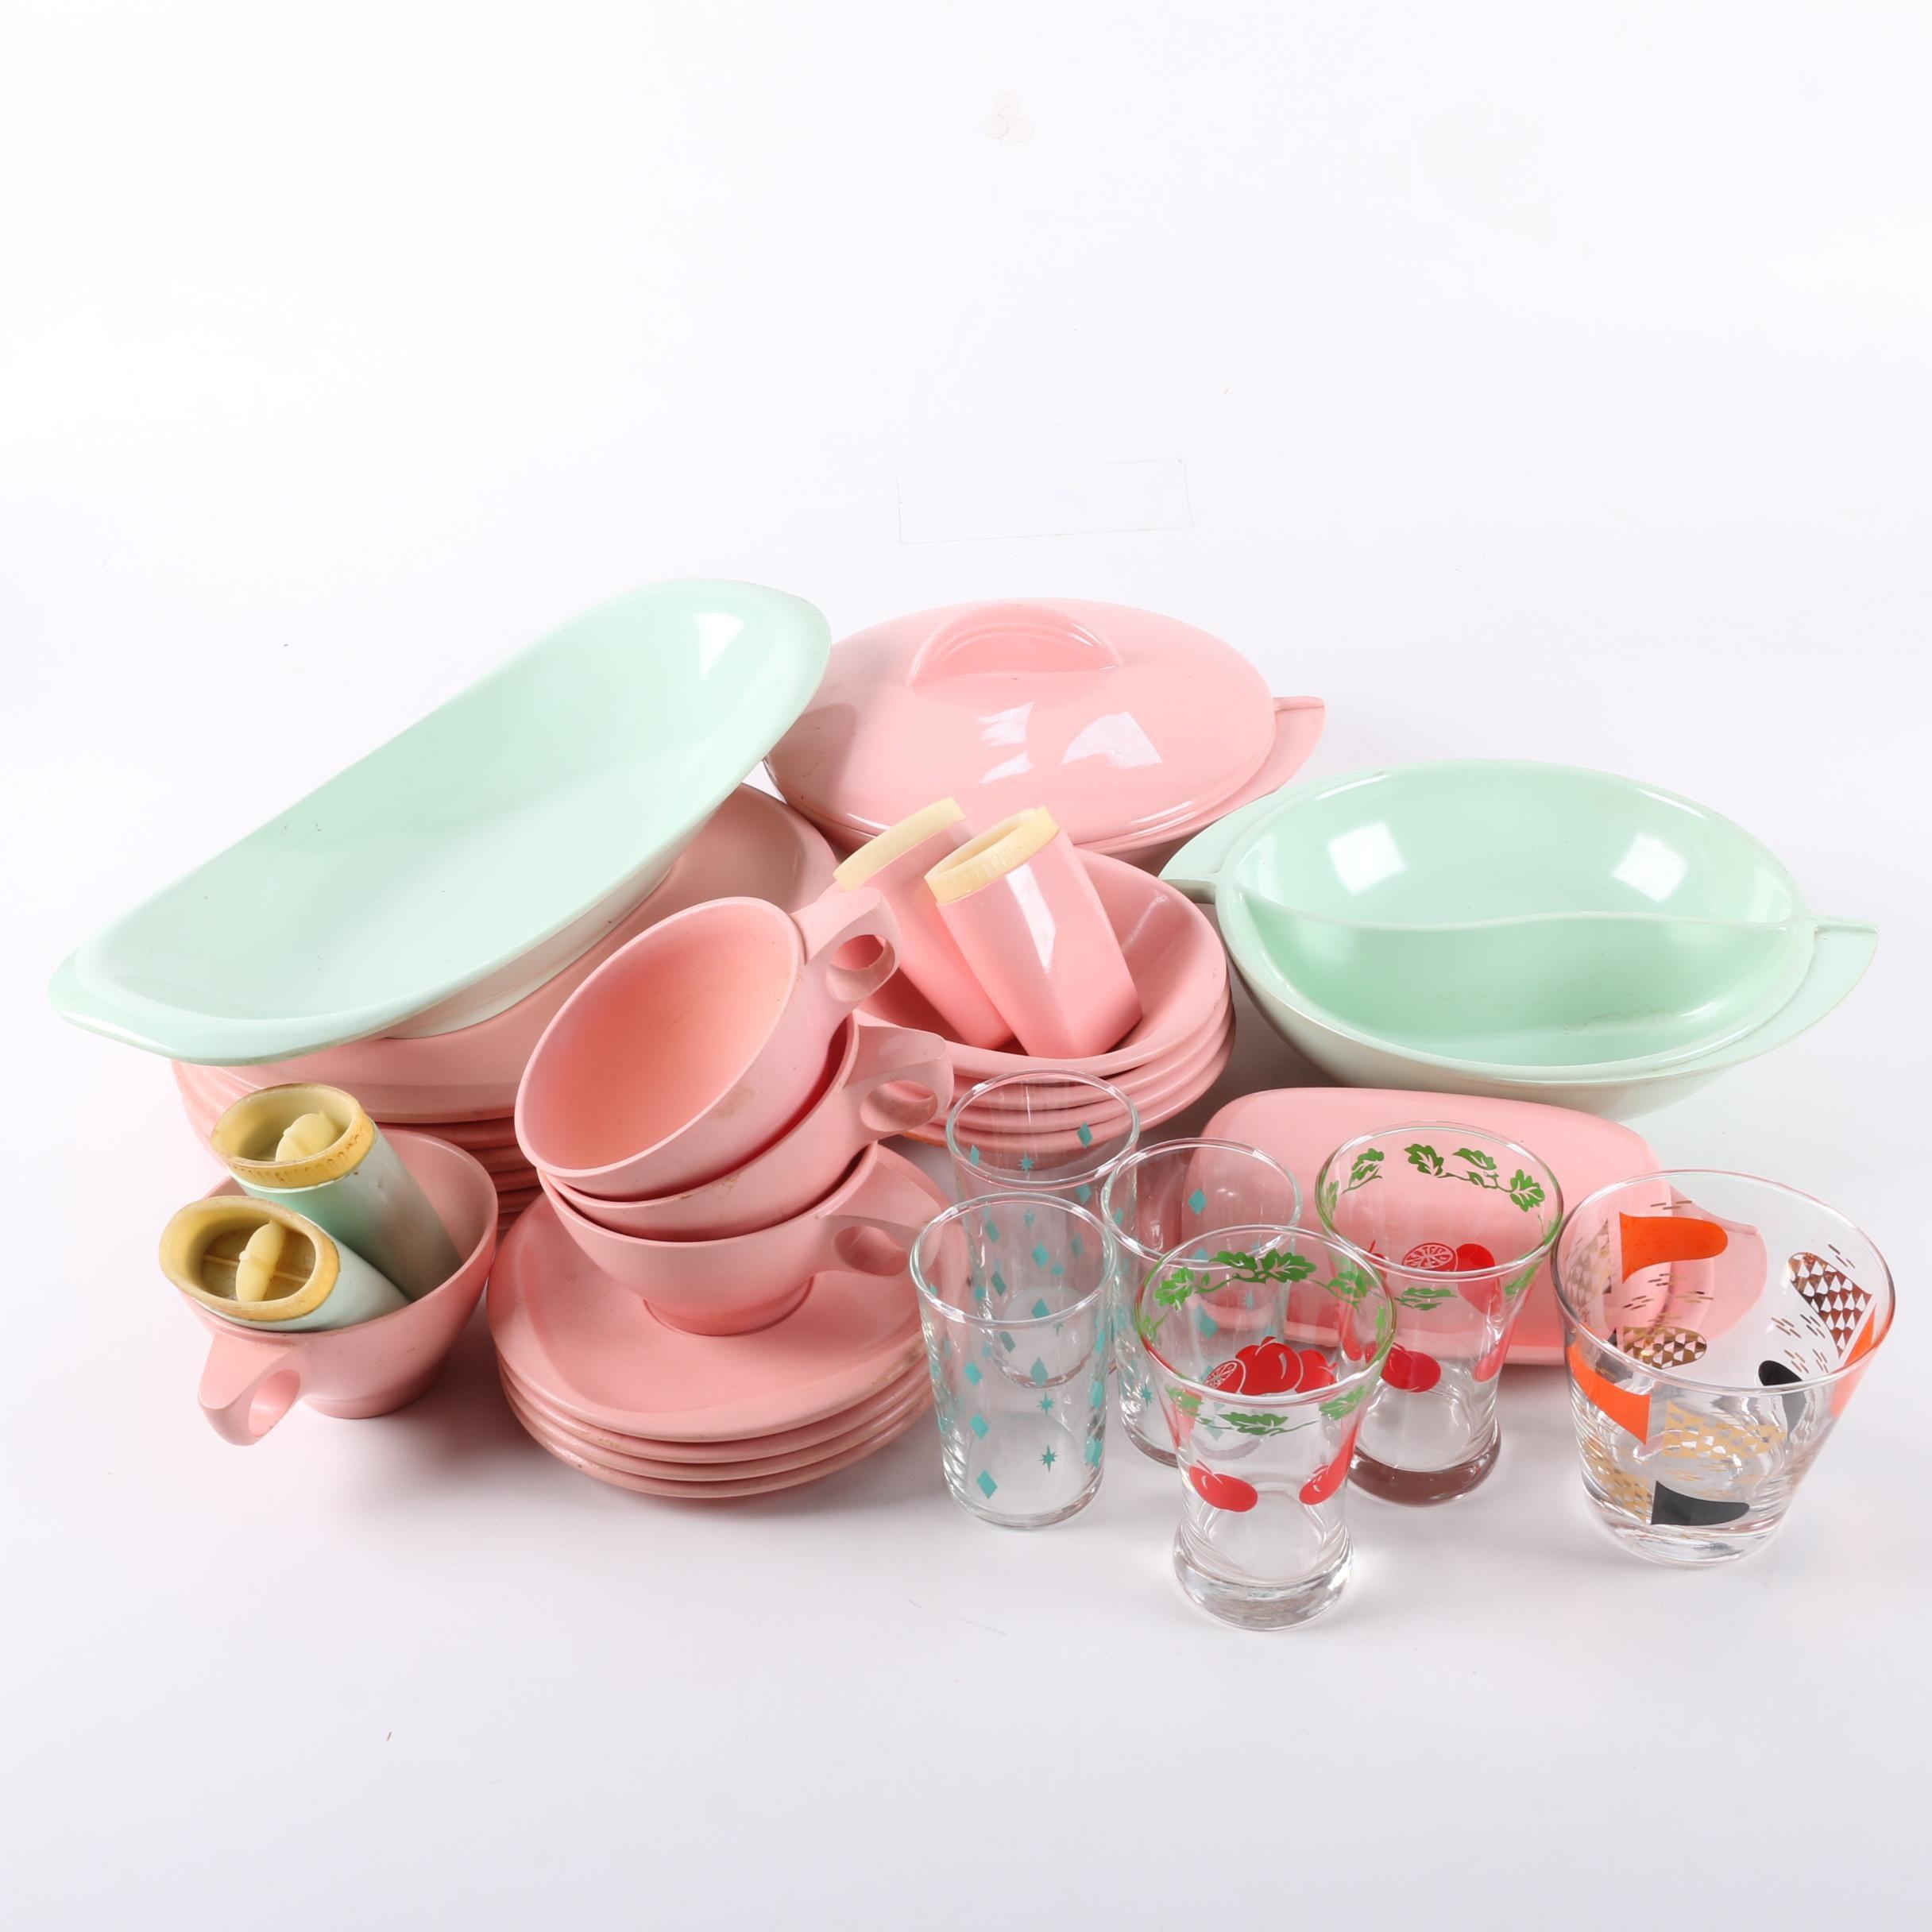 Vintage Melamine Tableware and Glass Tumblers